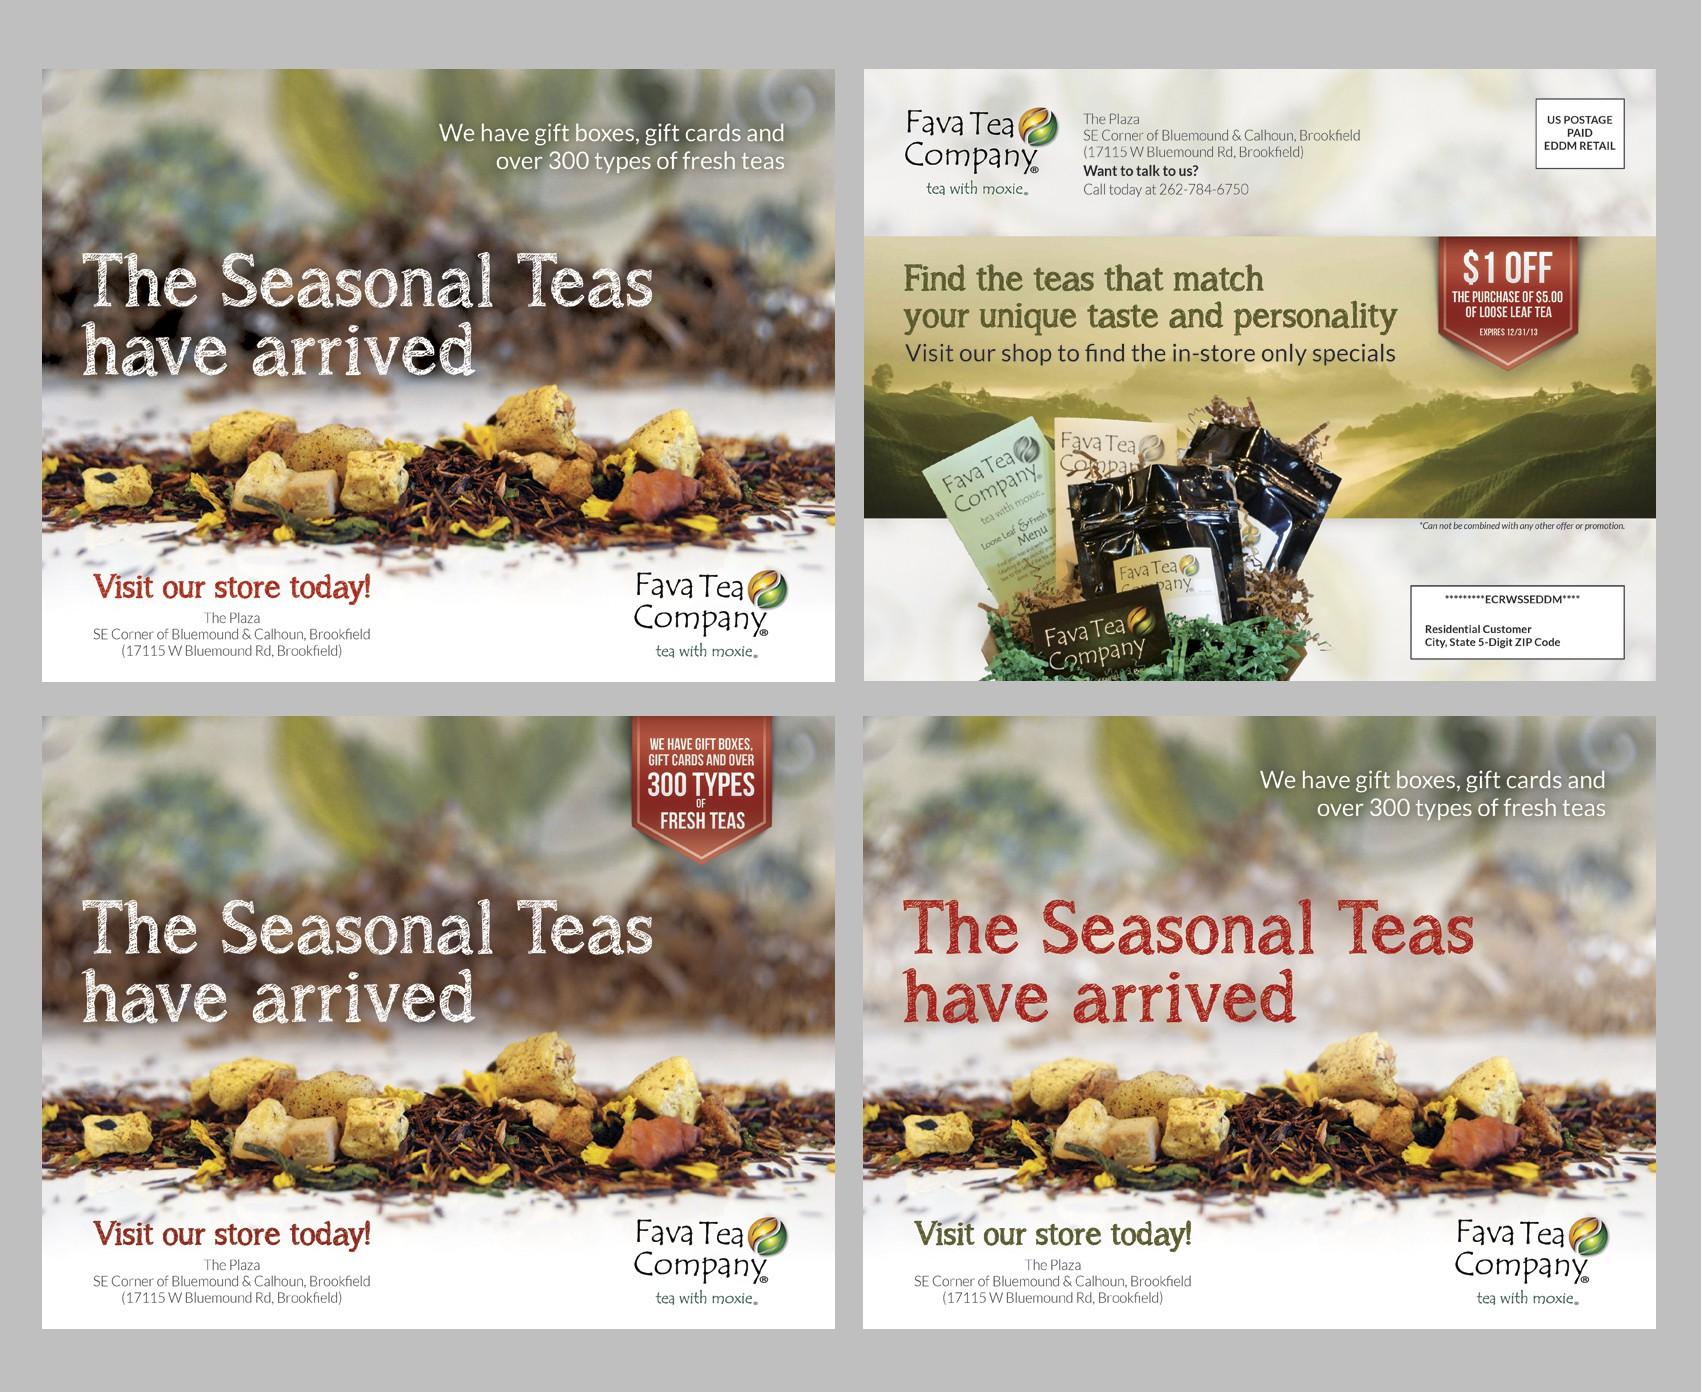 Fava Tea Company needs a new postcard, flyer or print